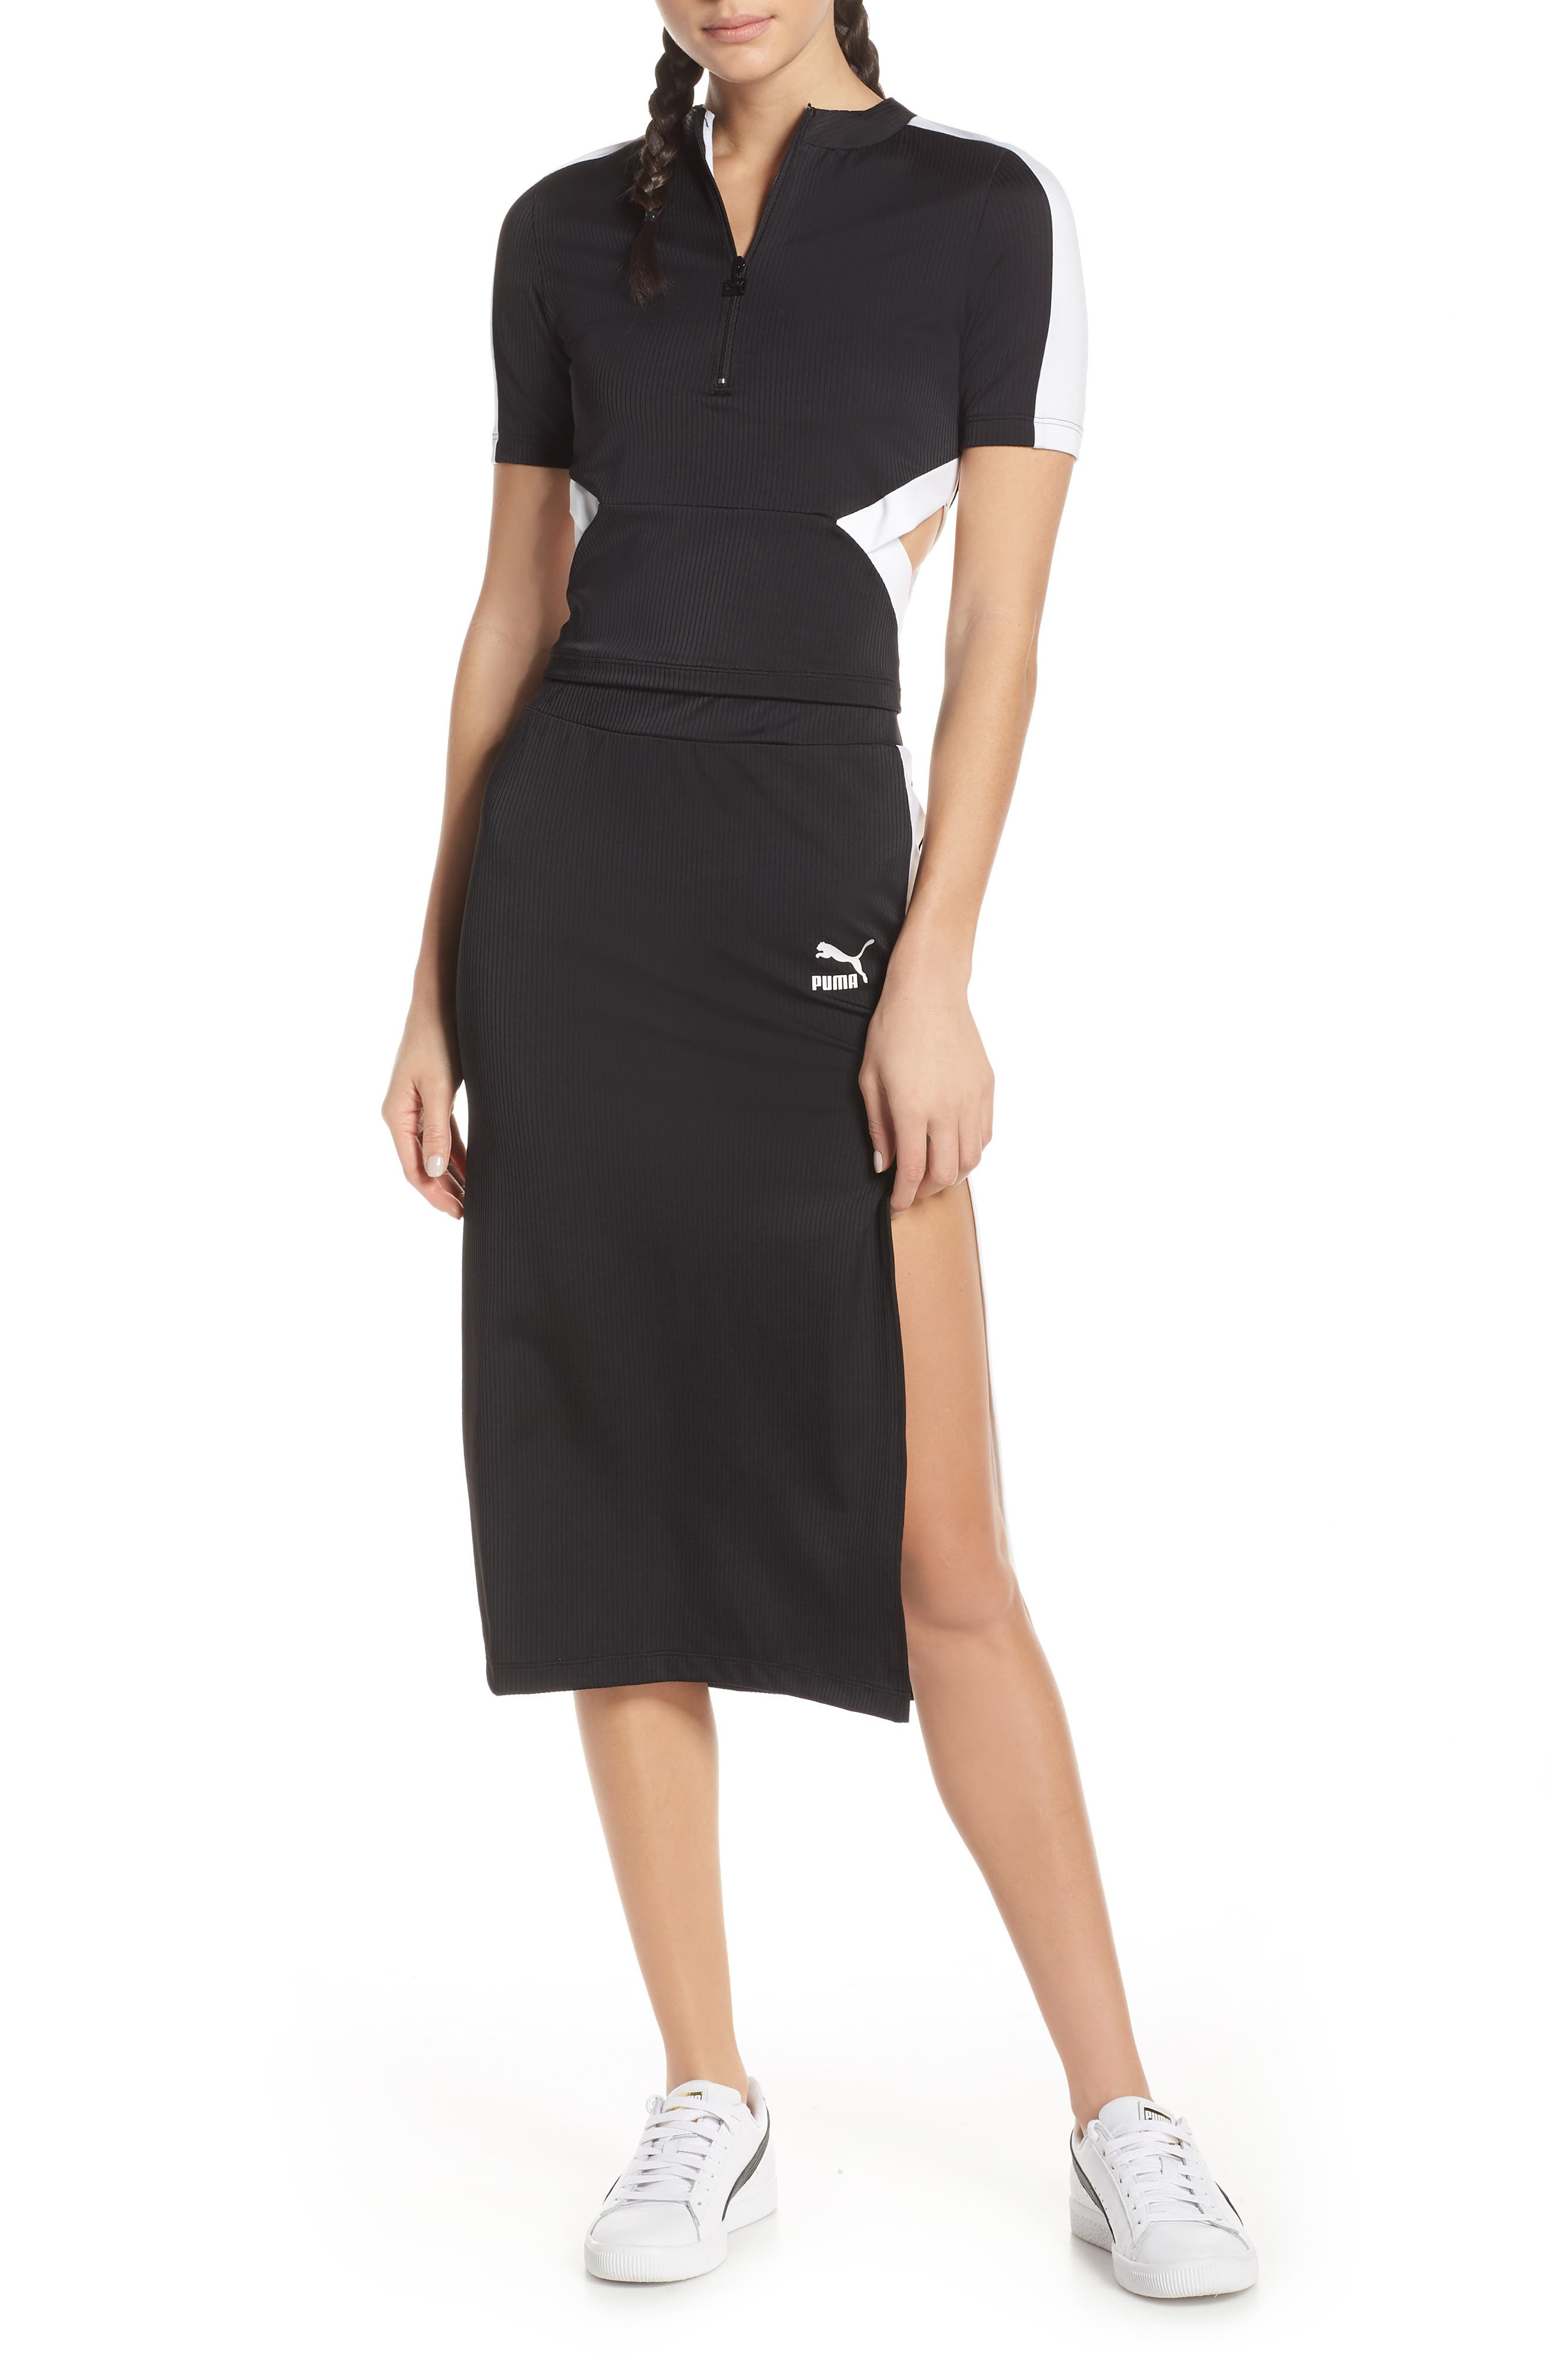 PUMA, Classics Ribbed Skirt, Alternate thumbnail 8, color, 001